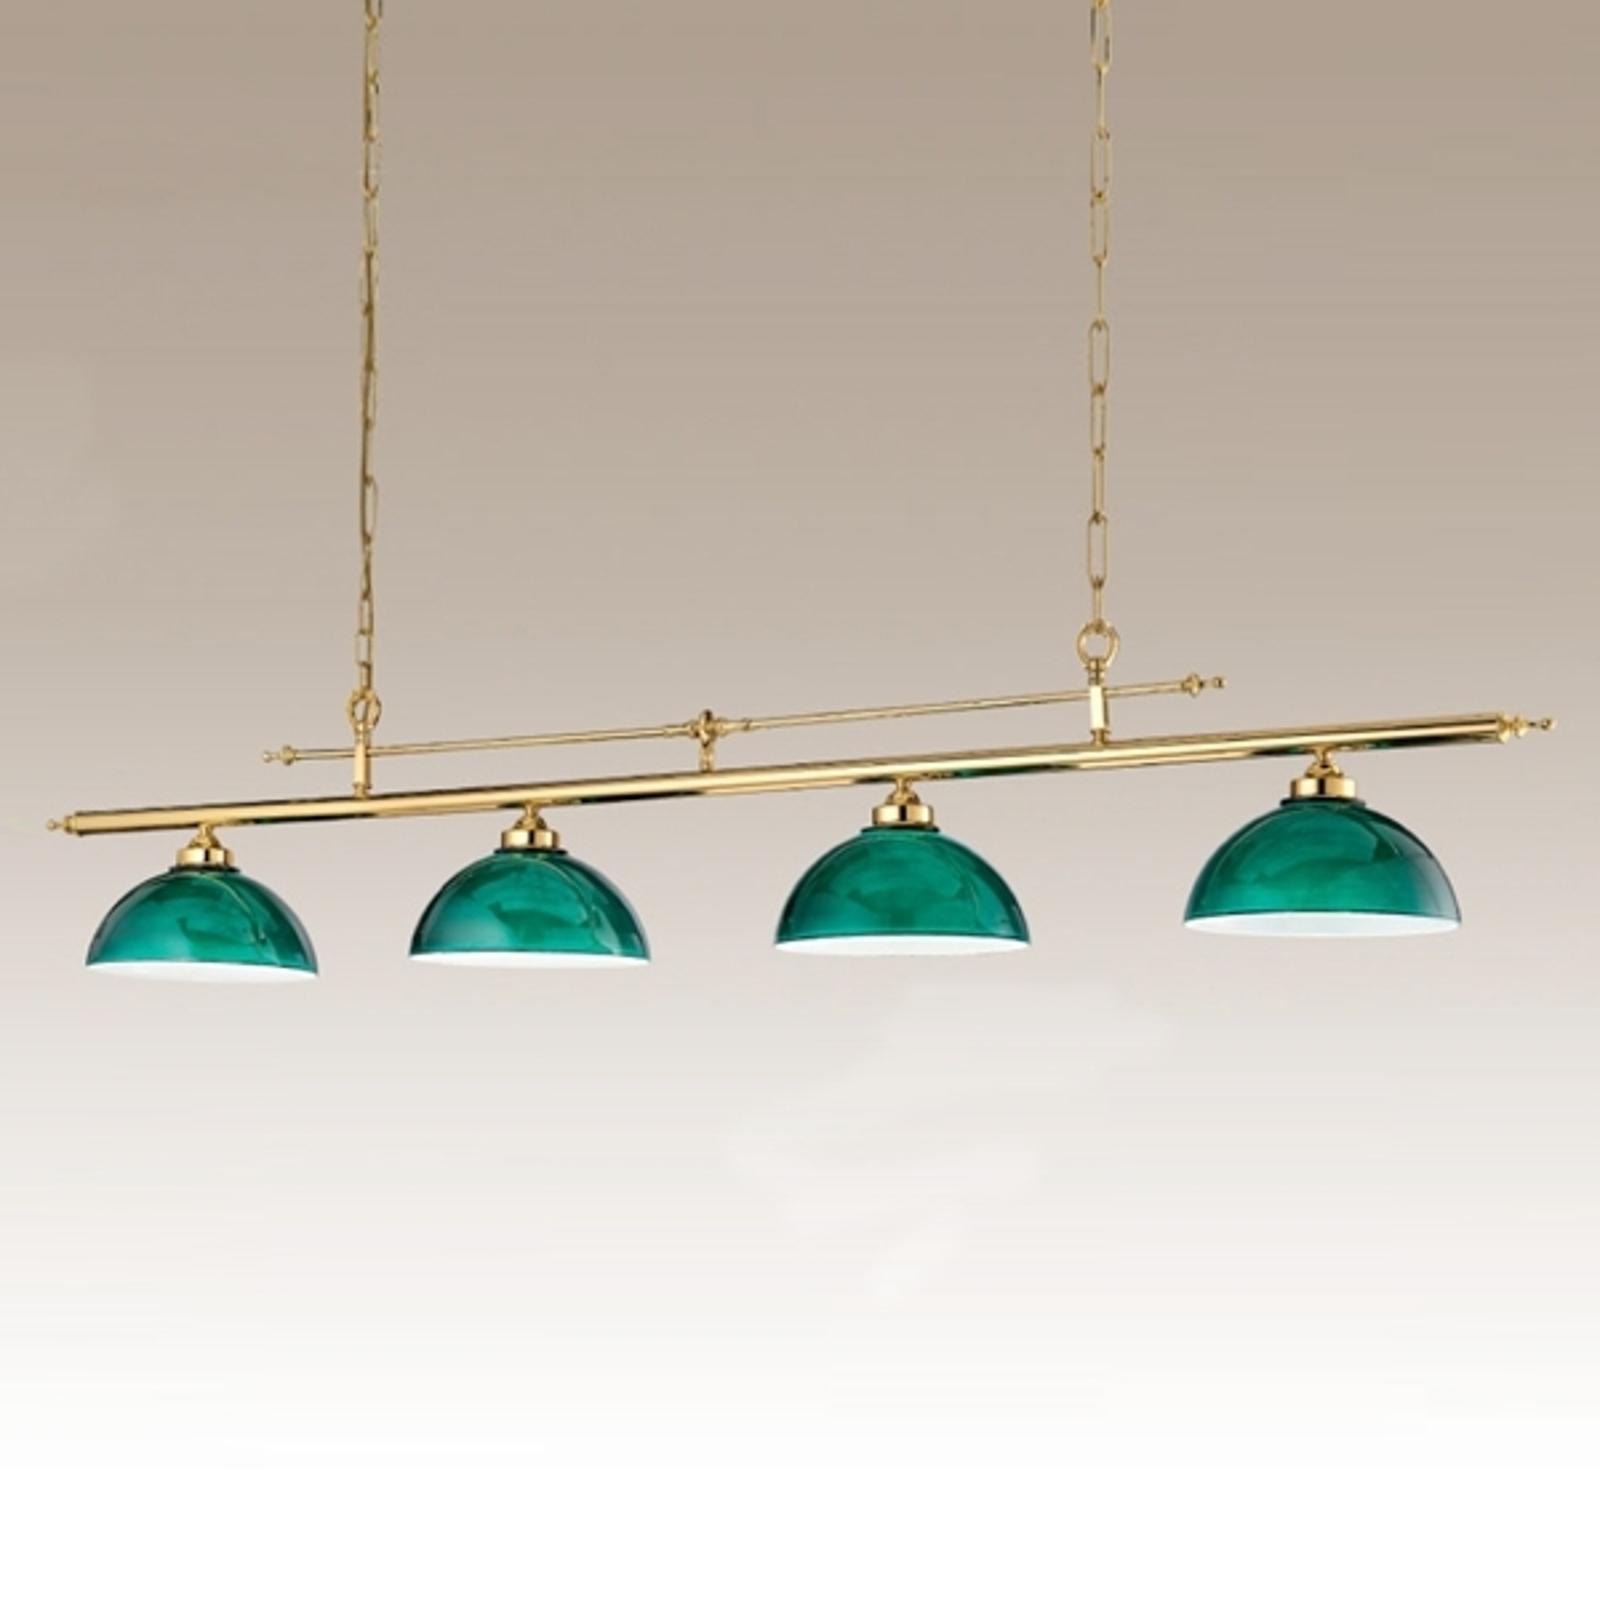 Hanglamp Biliardo 4-lichts